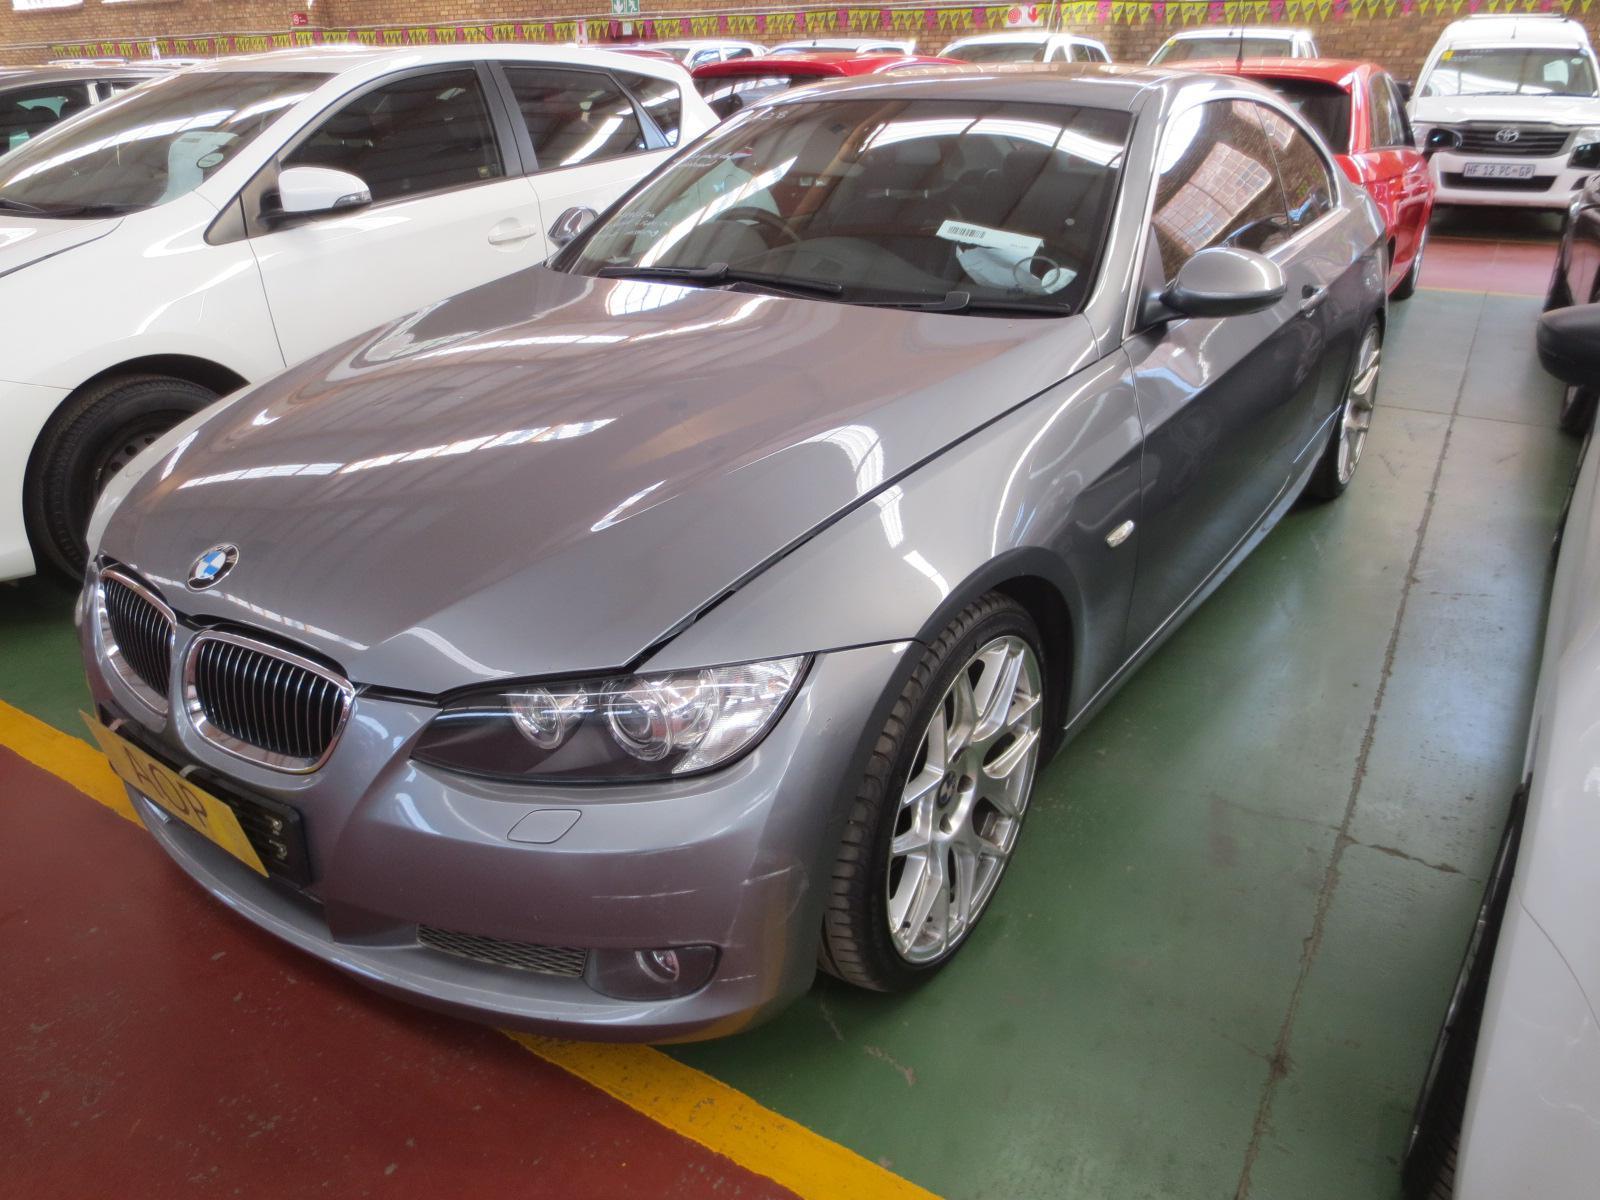 2007 NOPLATES BMW 335i COUPE A/T (E92) (VIN #: ) (ODO